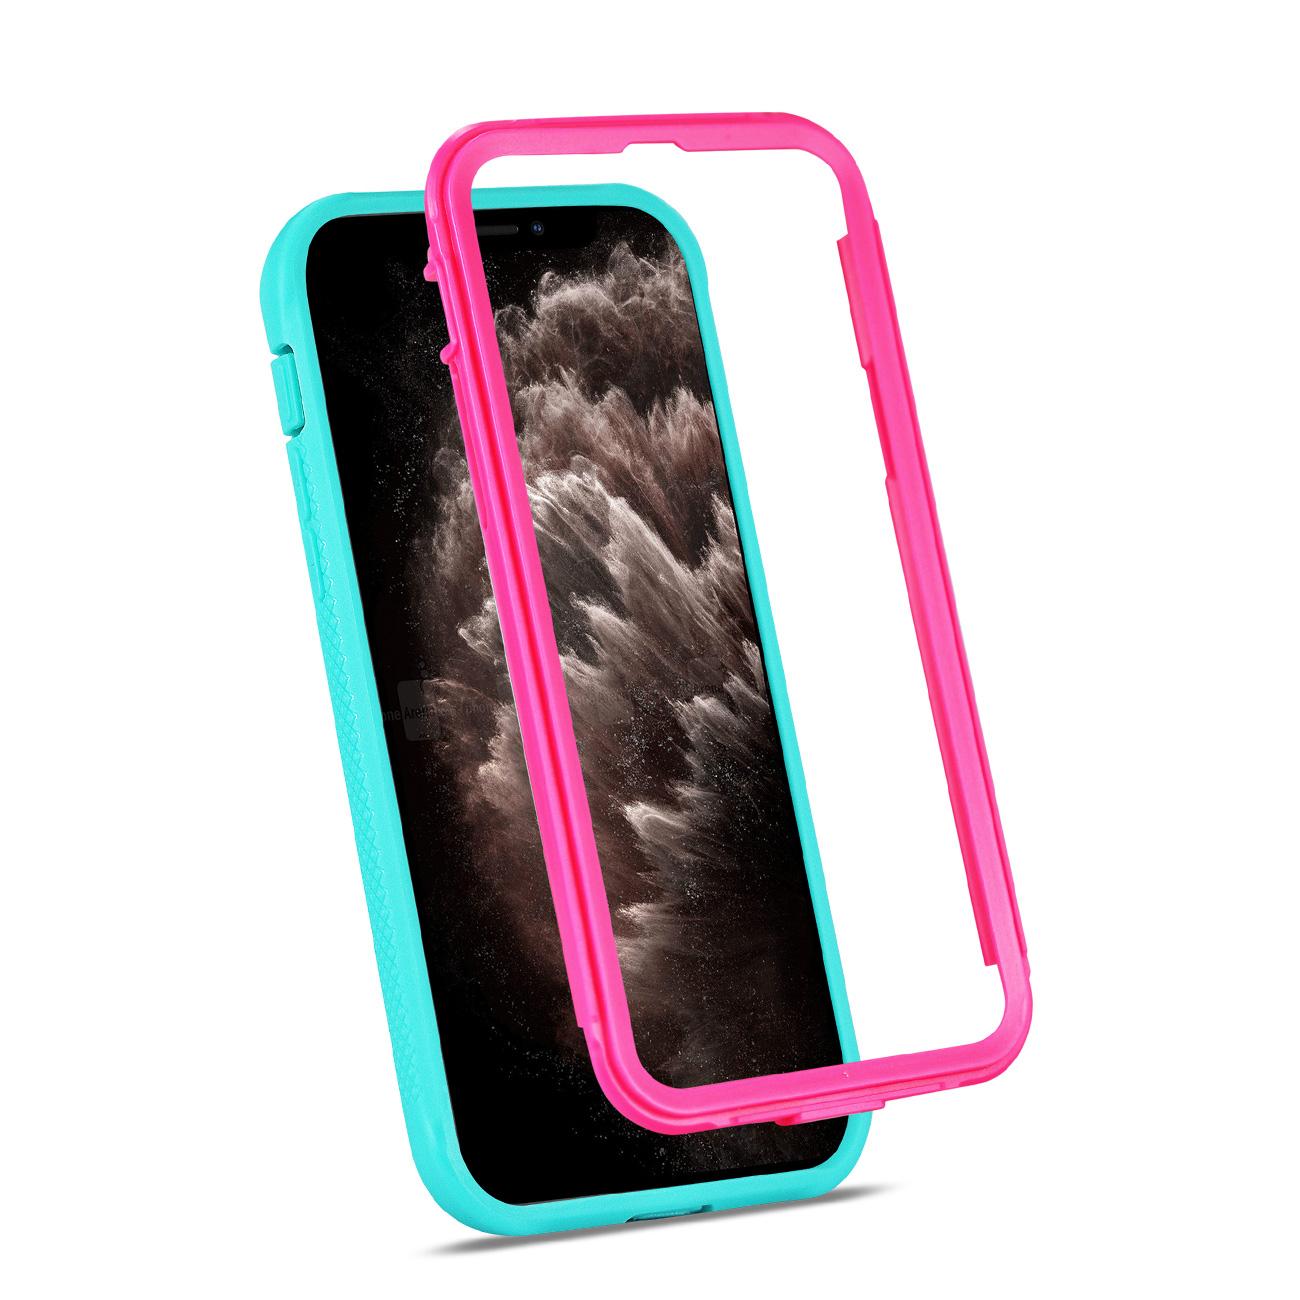 APPLE IPHONE 11 PRO Bumper Case In Blue